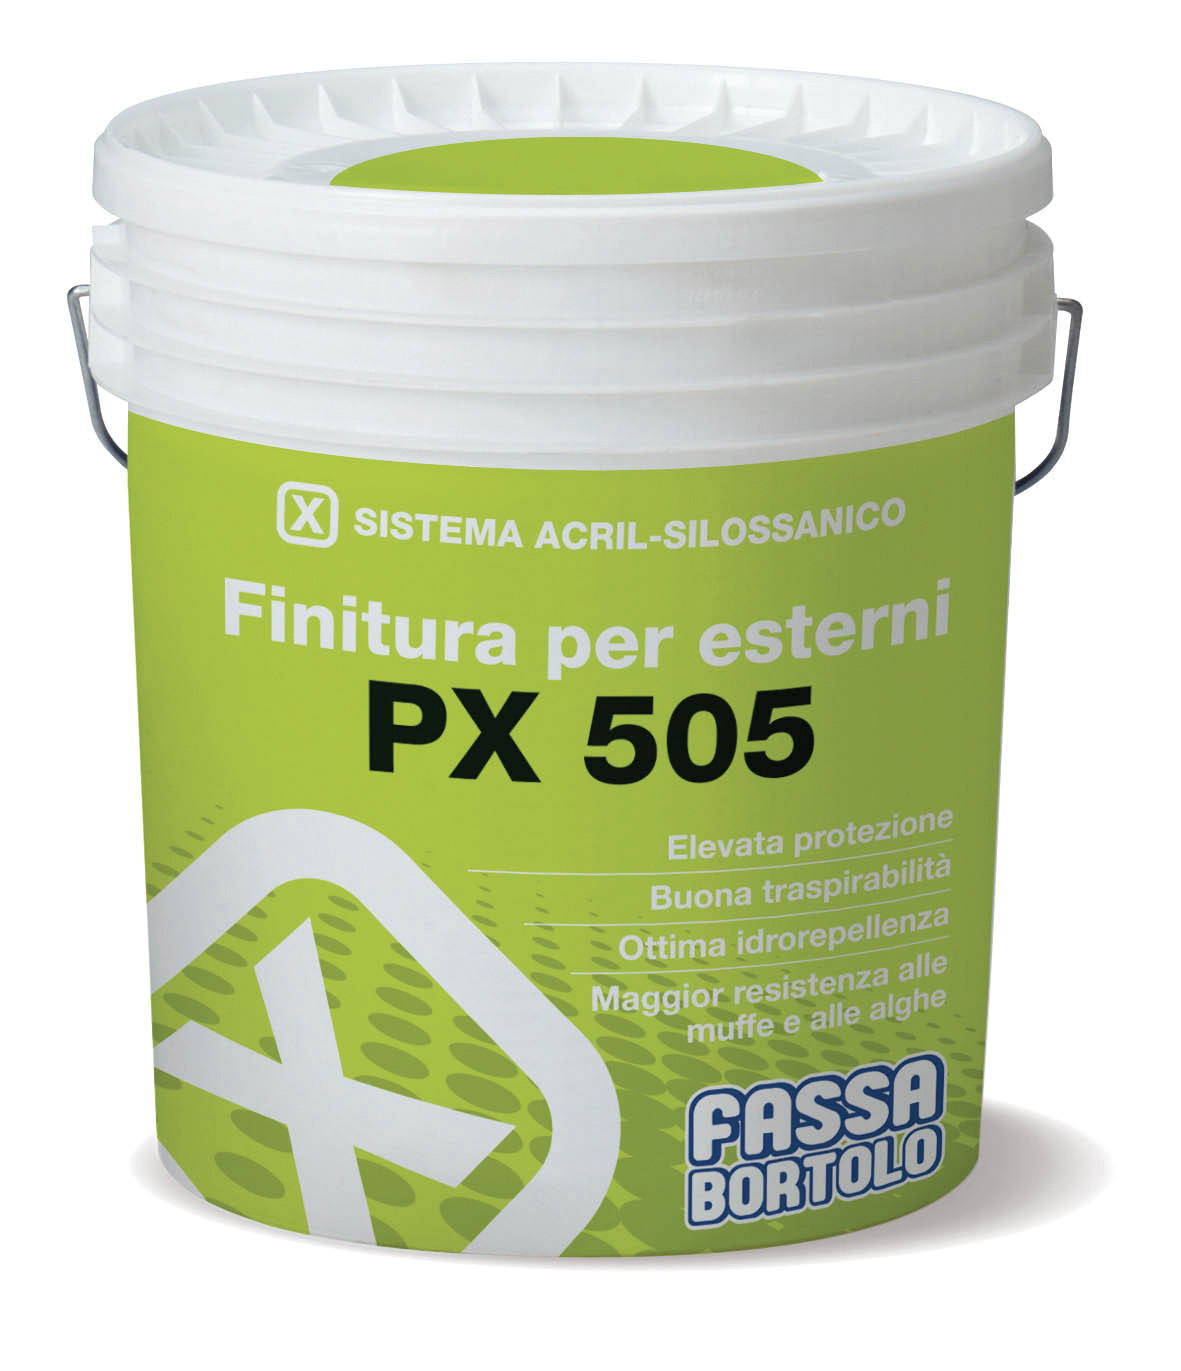 PX 505